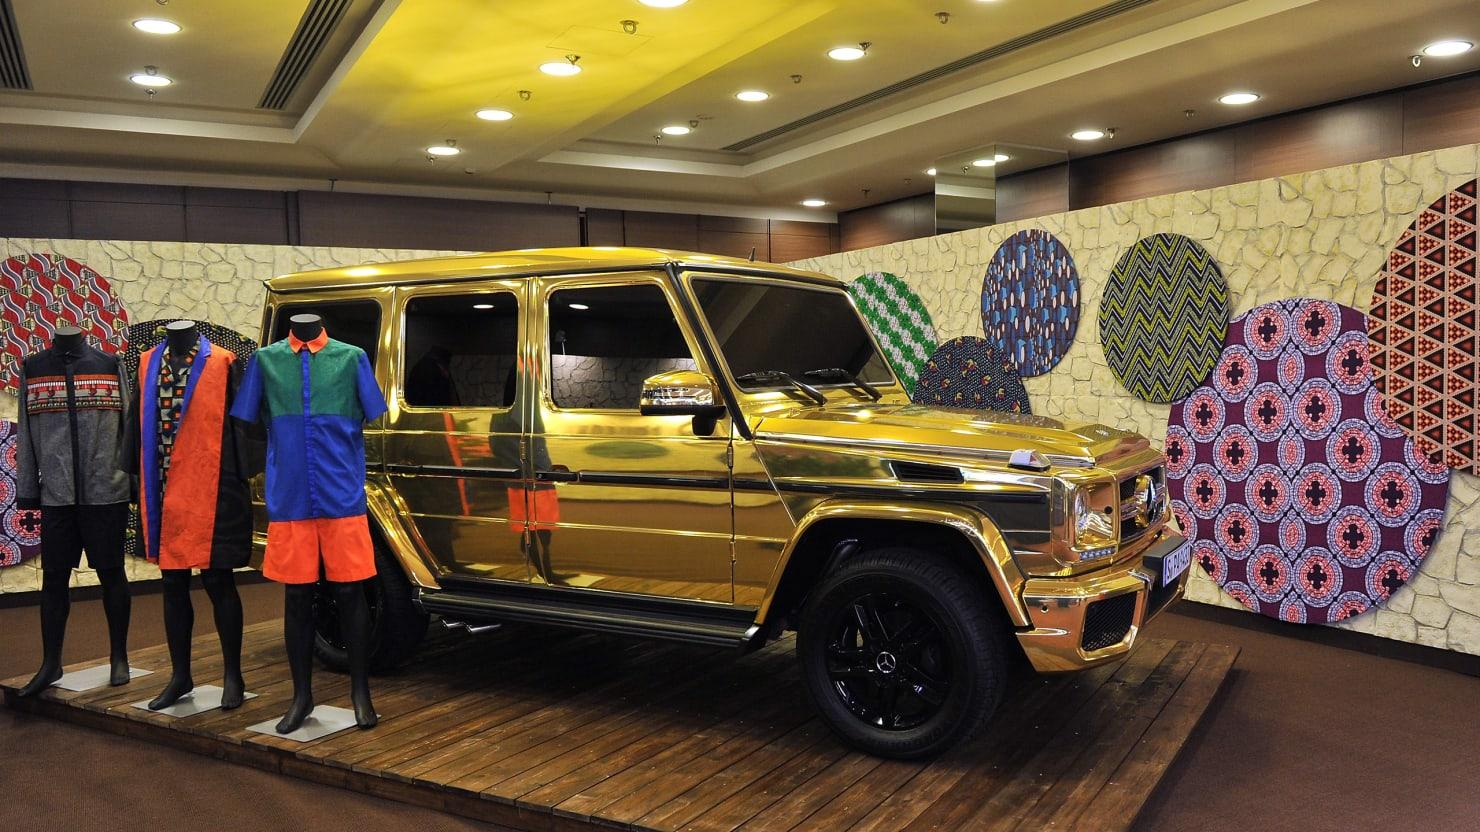 Luxury Fashion in Africa?